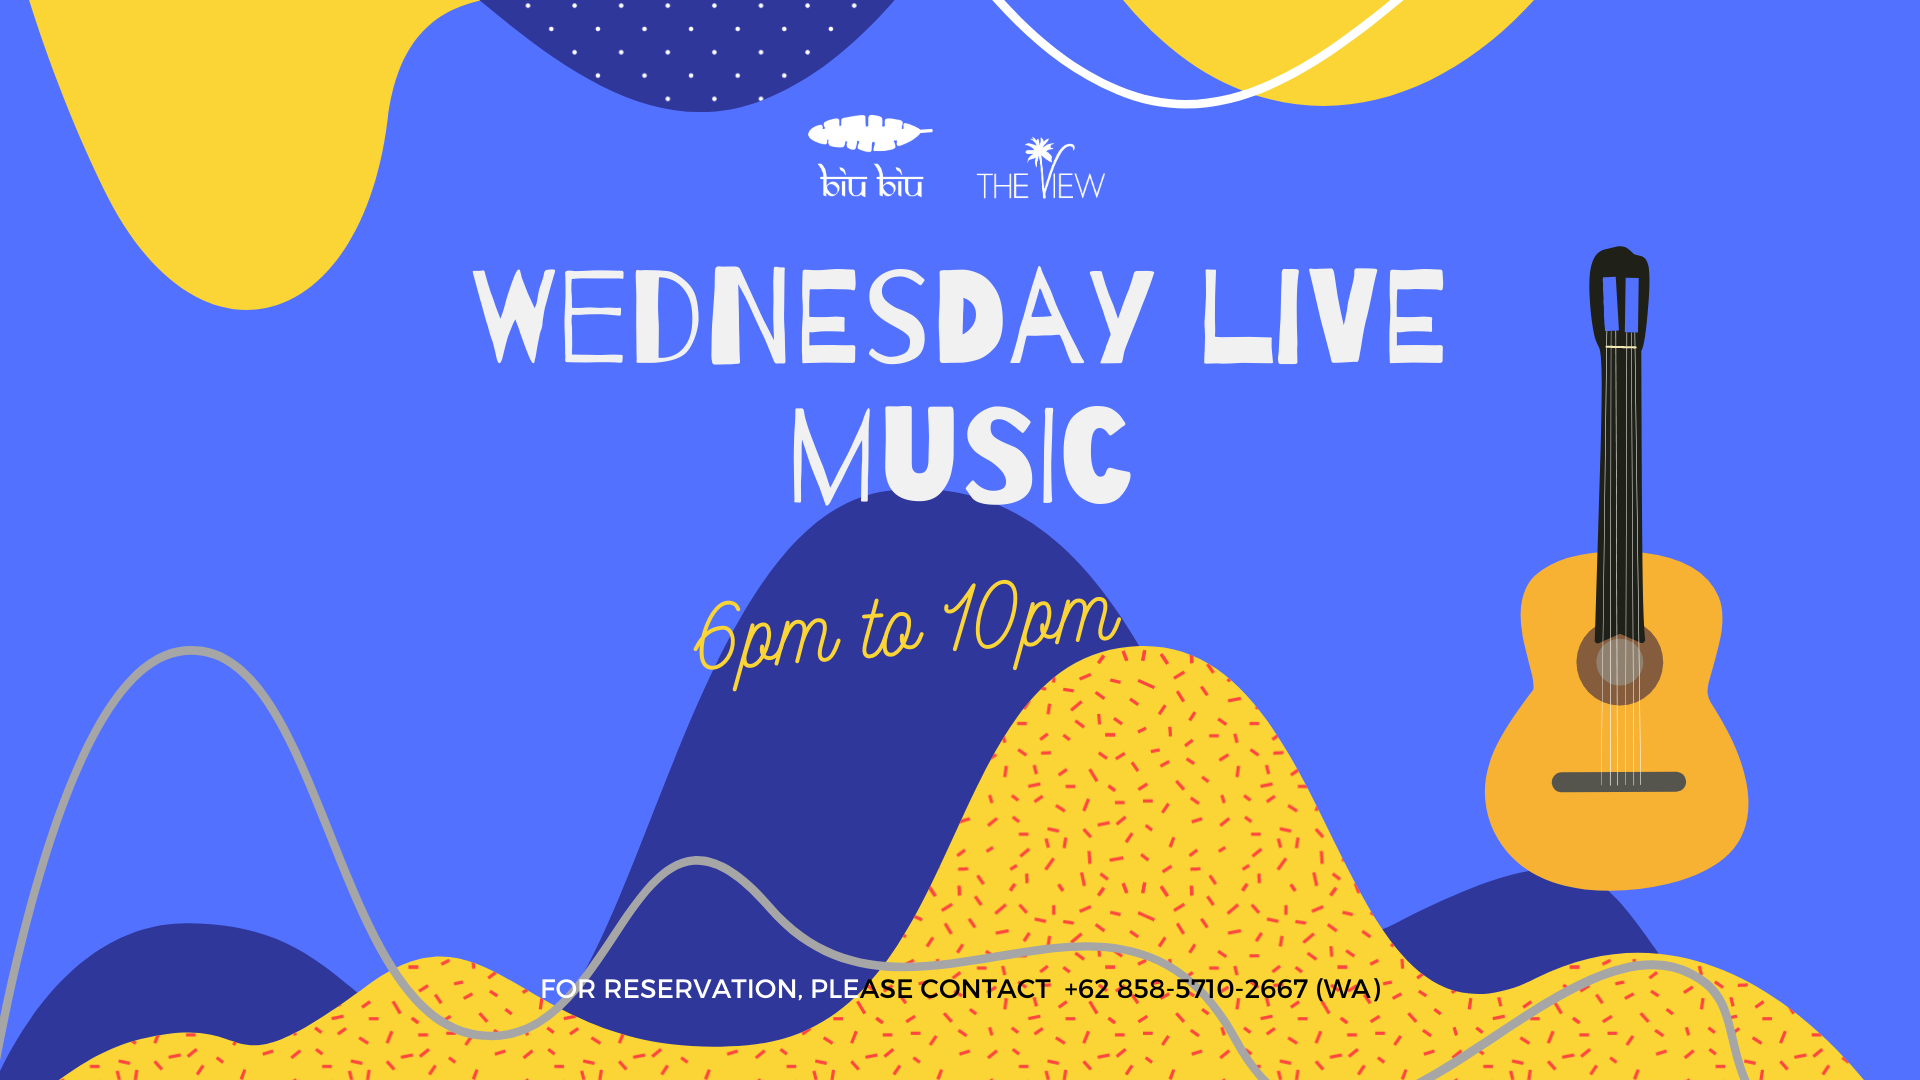 Wednesday live music